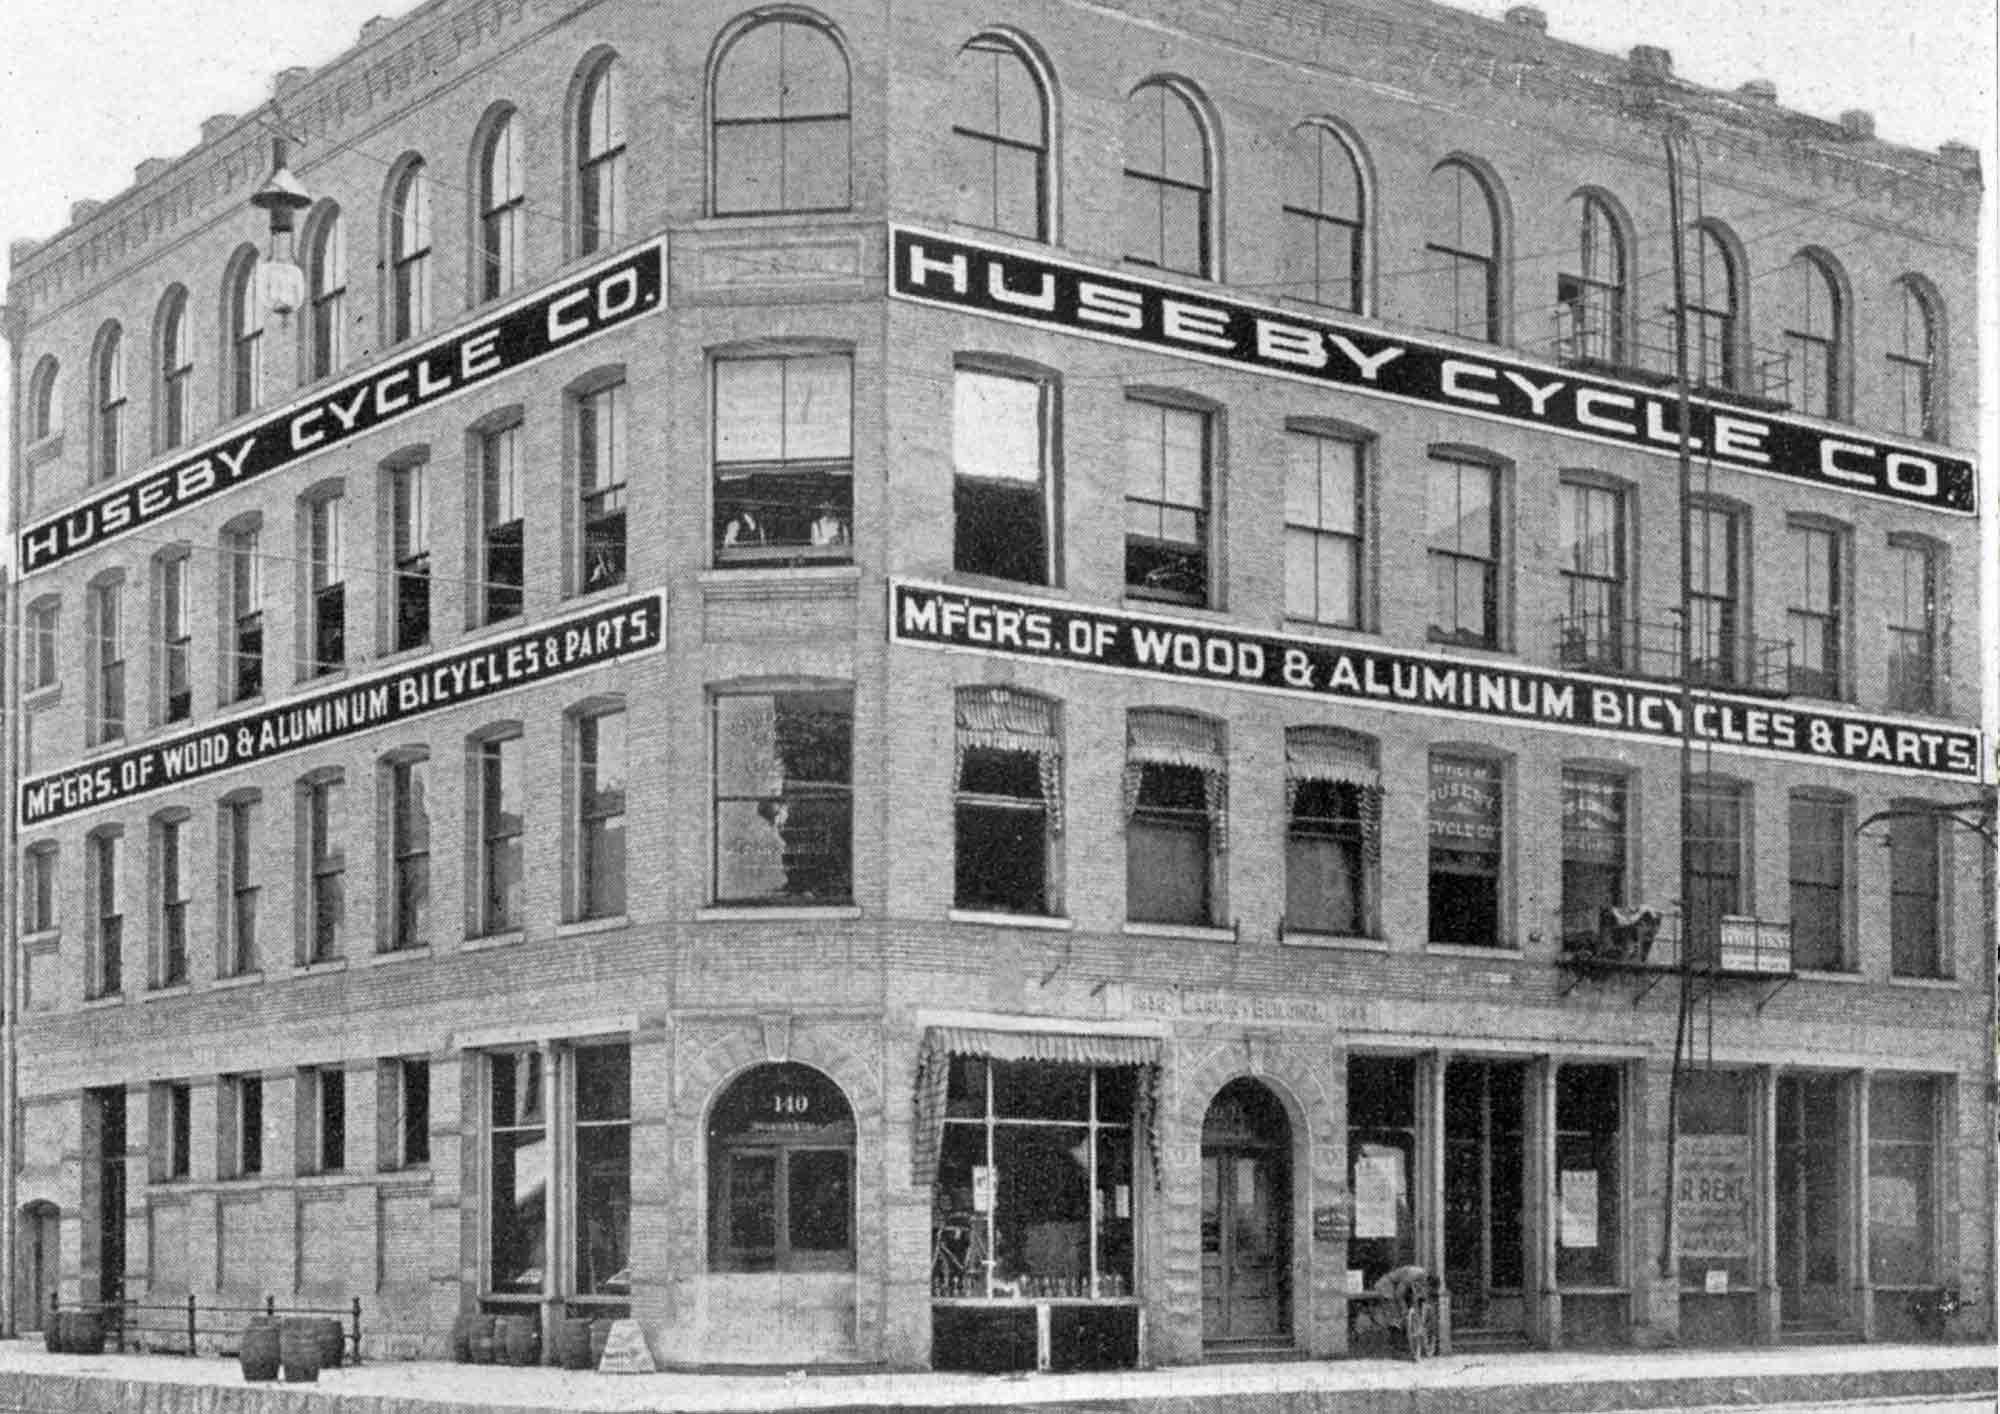 Artistry-Milwaukee-history-Huseby-Cycle-Co.jpg